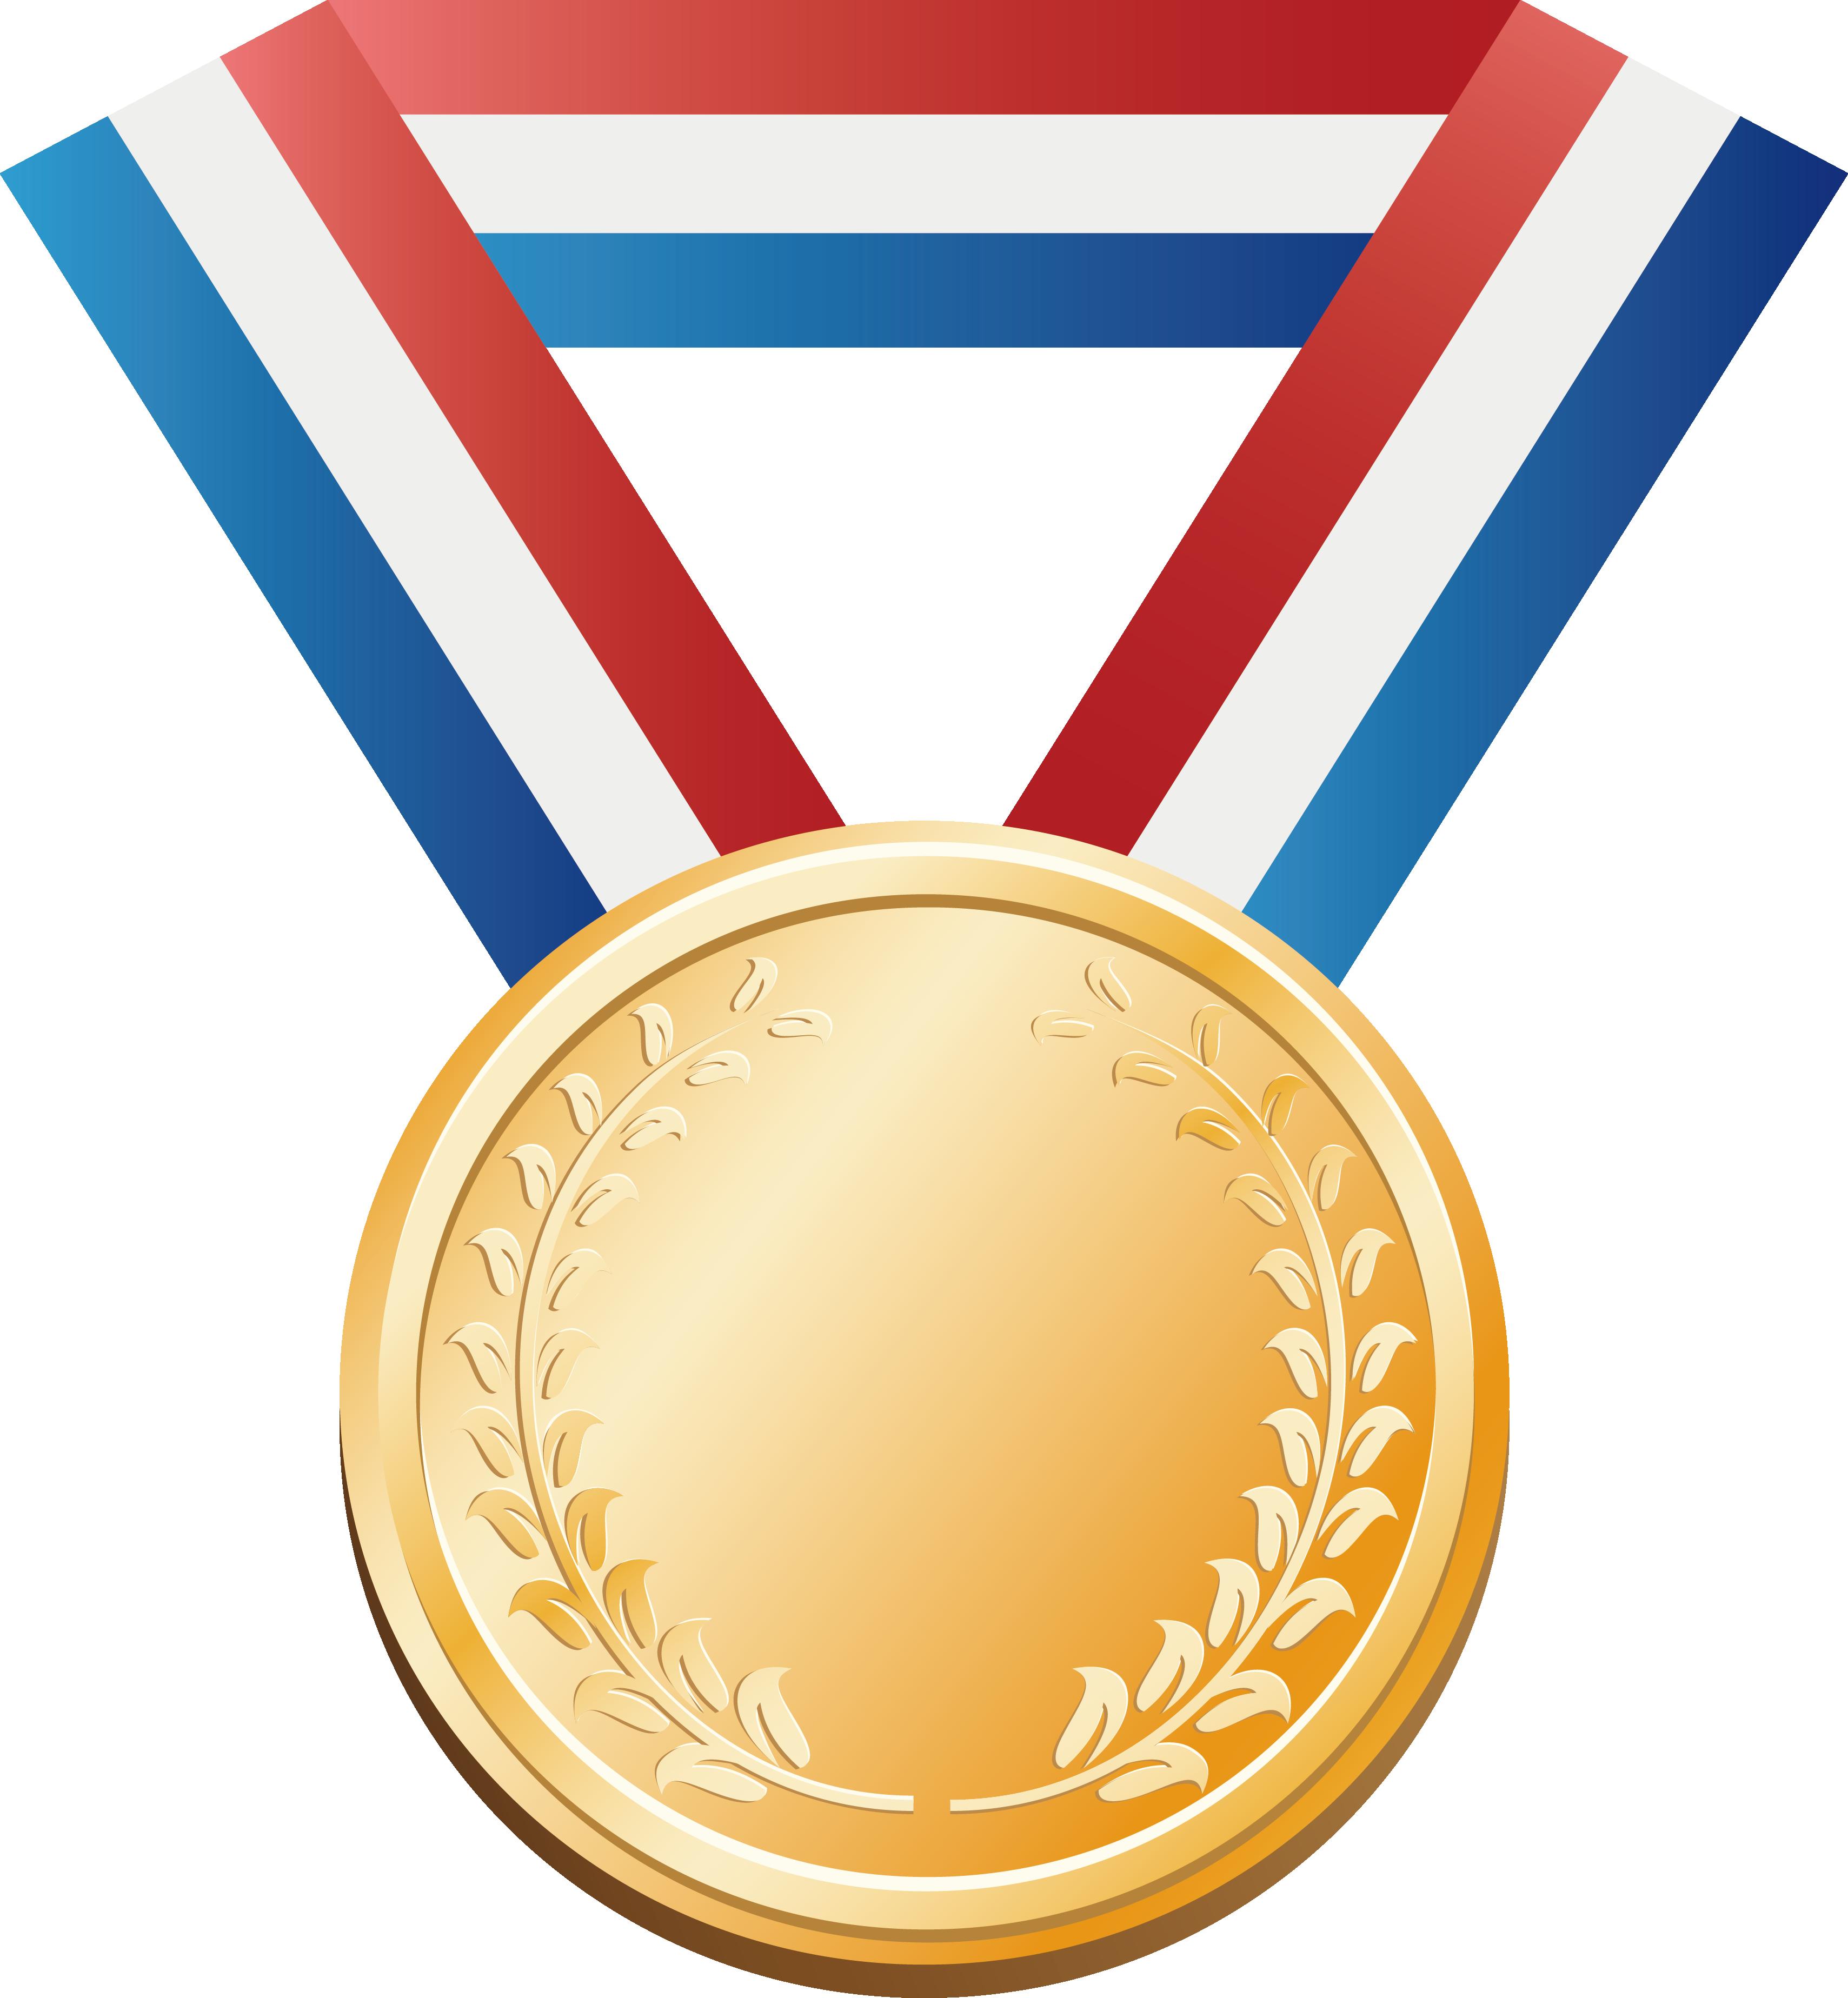 Medal,Gold medal,Bronze medal,Award,Silver medal,Clip art.